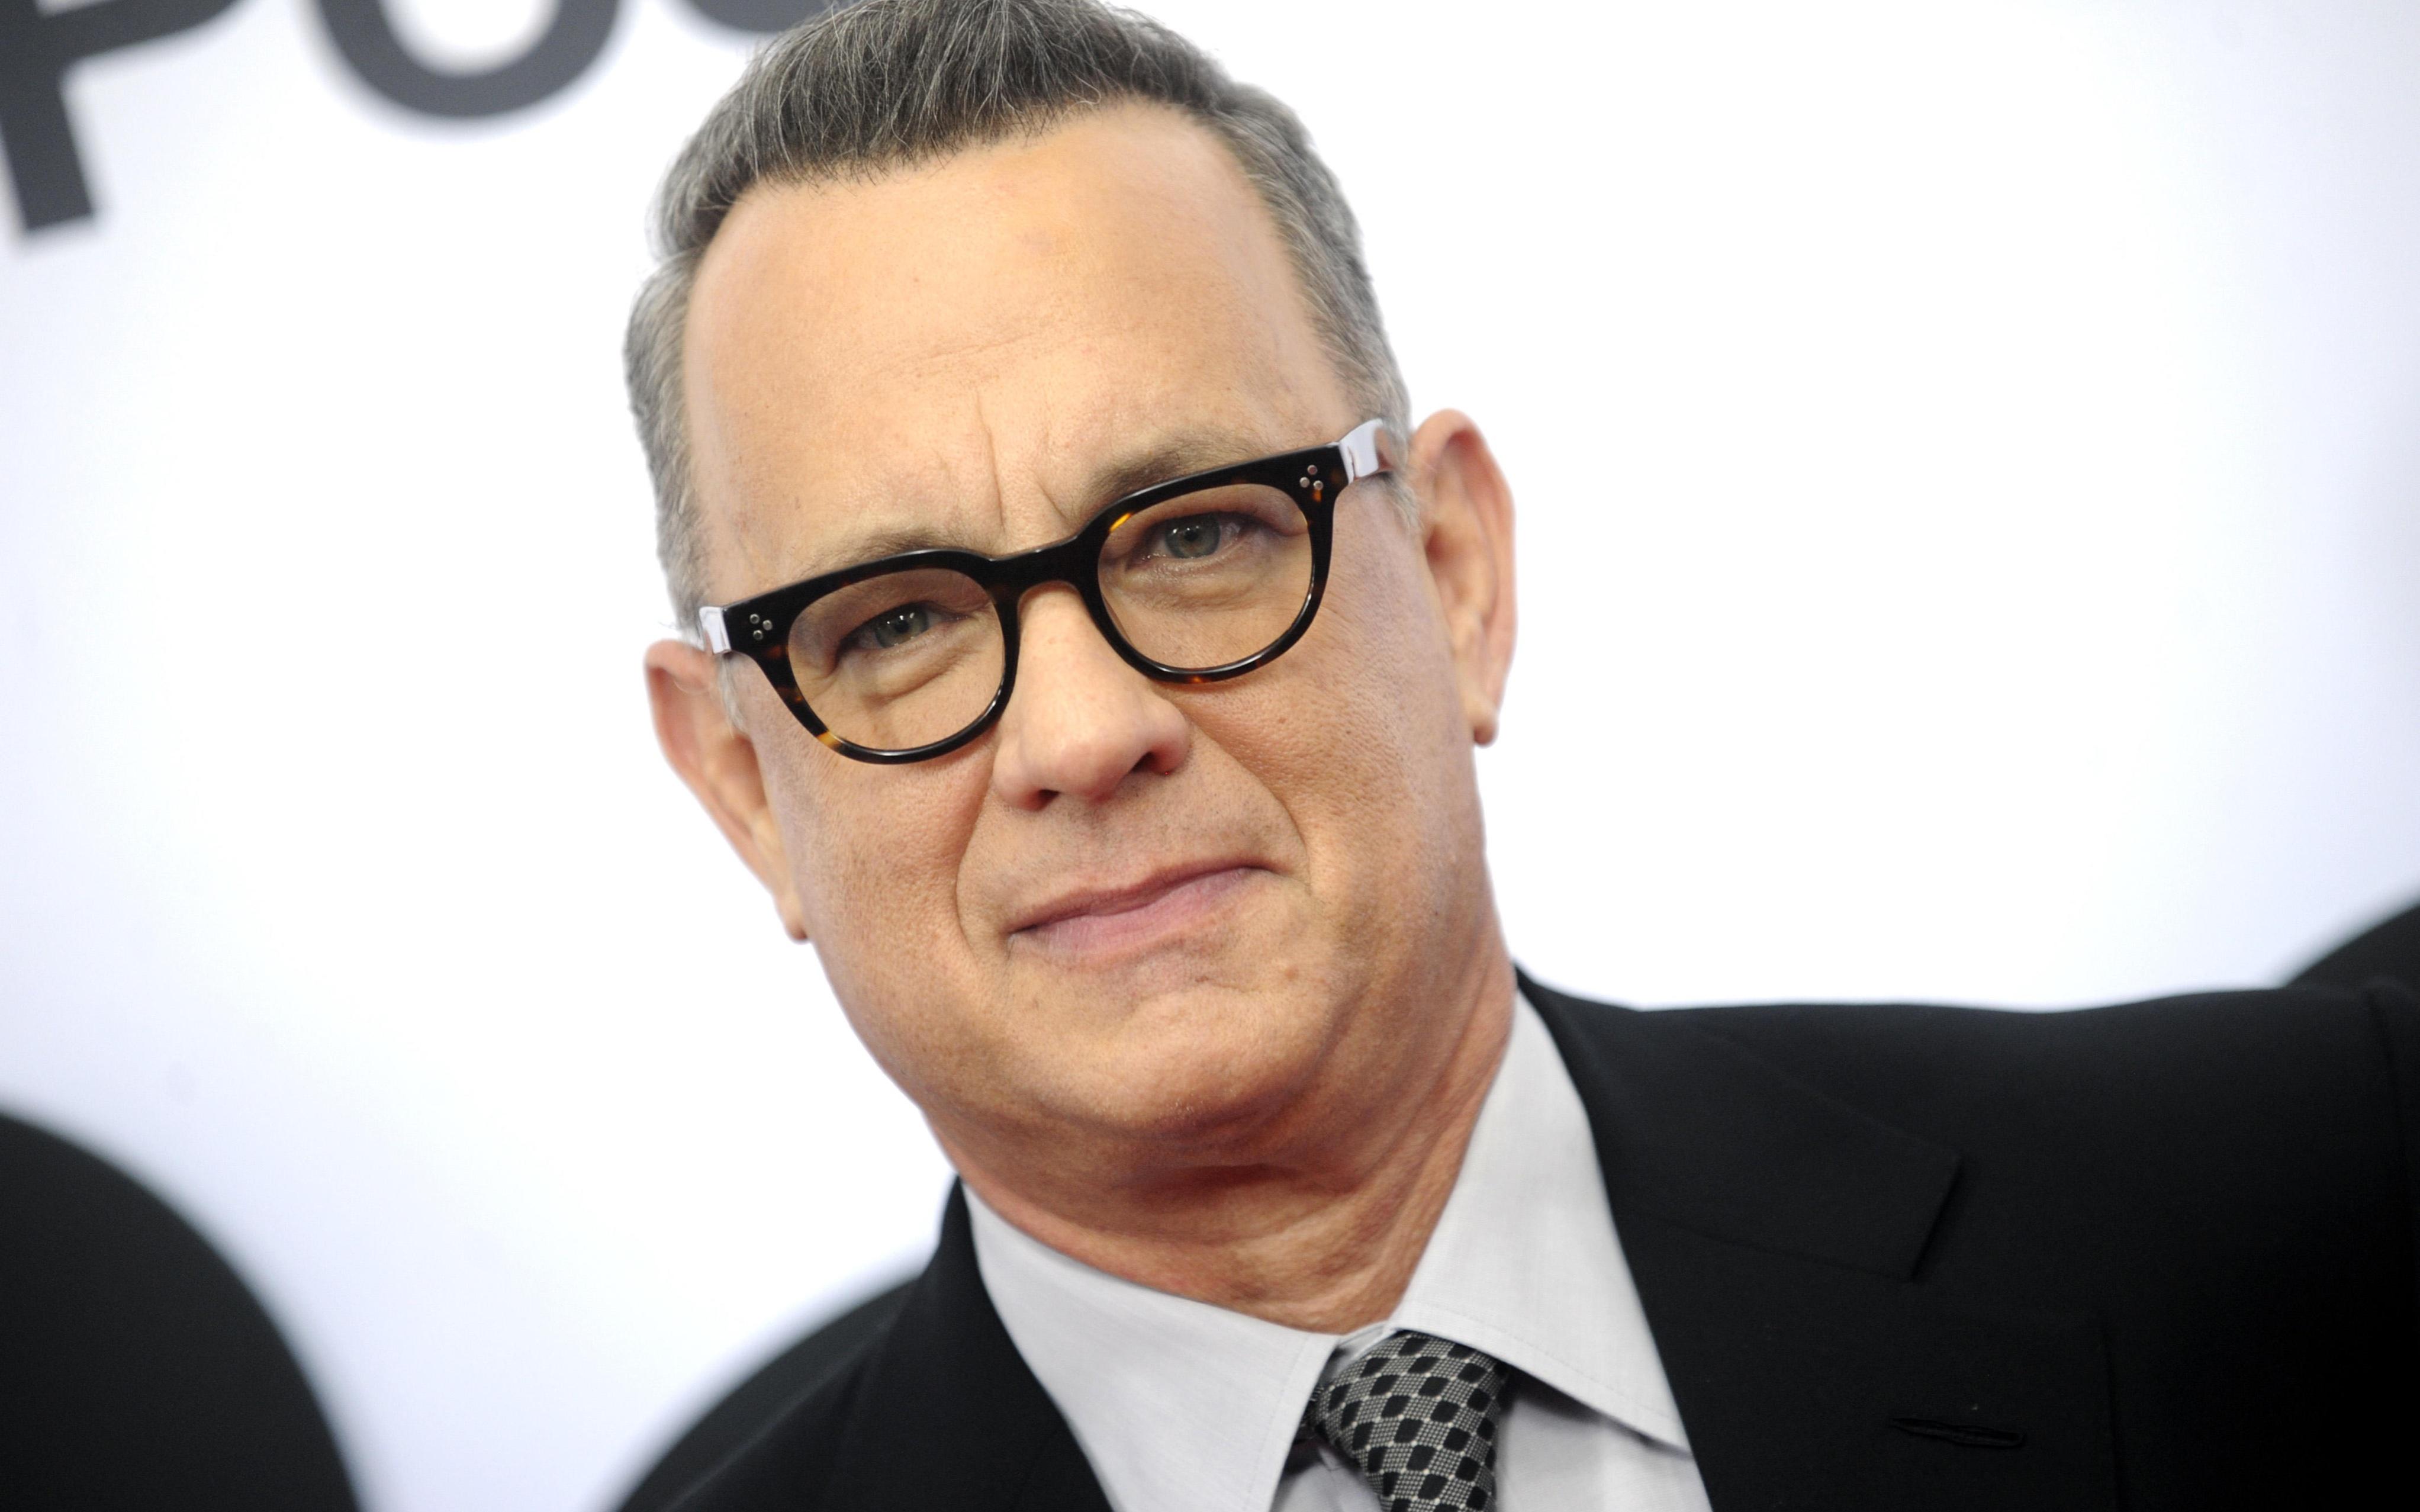 Wes Anderson Tom Hanks nel cast del nuovo film